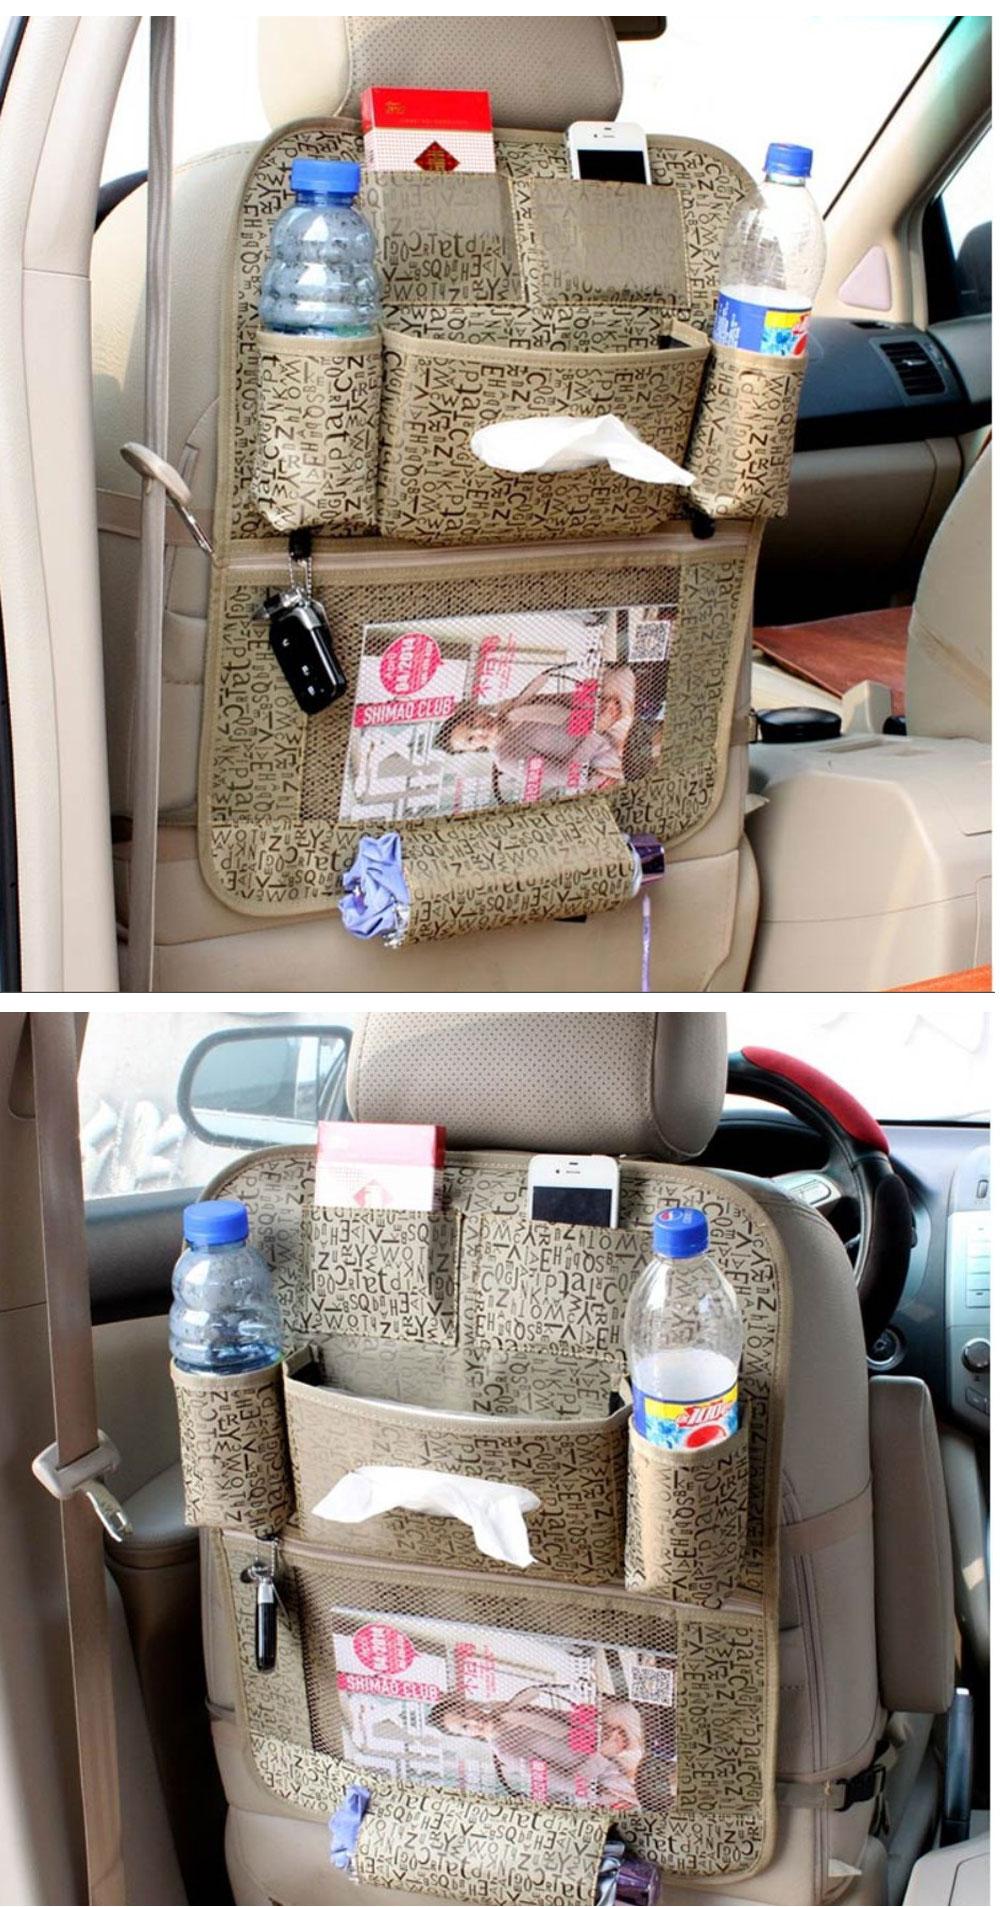 Car Organizer waterproof Car seat covers protector mat Car Storage Bags Seat Back Protector Case Cover Multi-Purpose 2